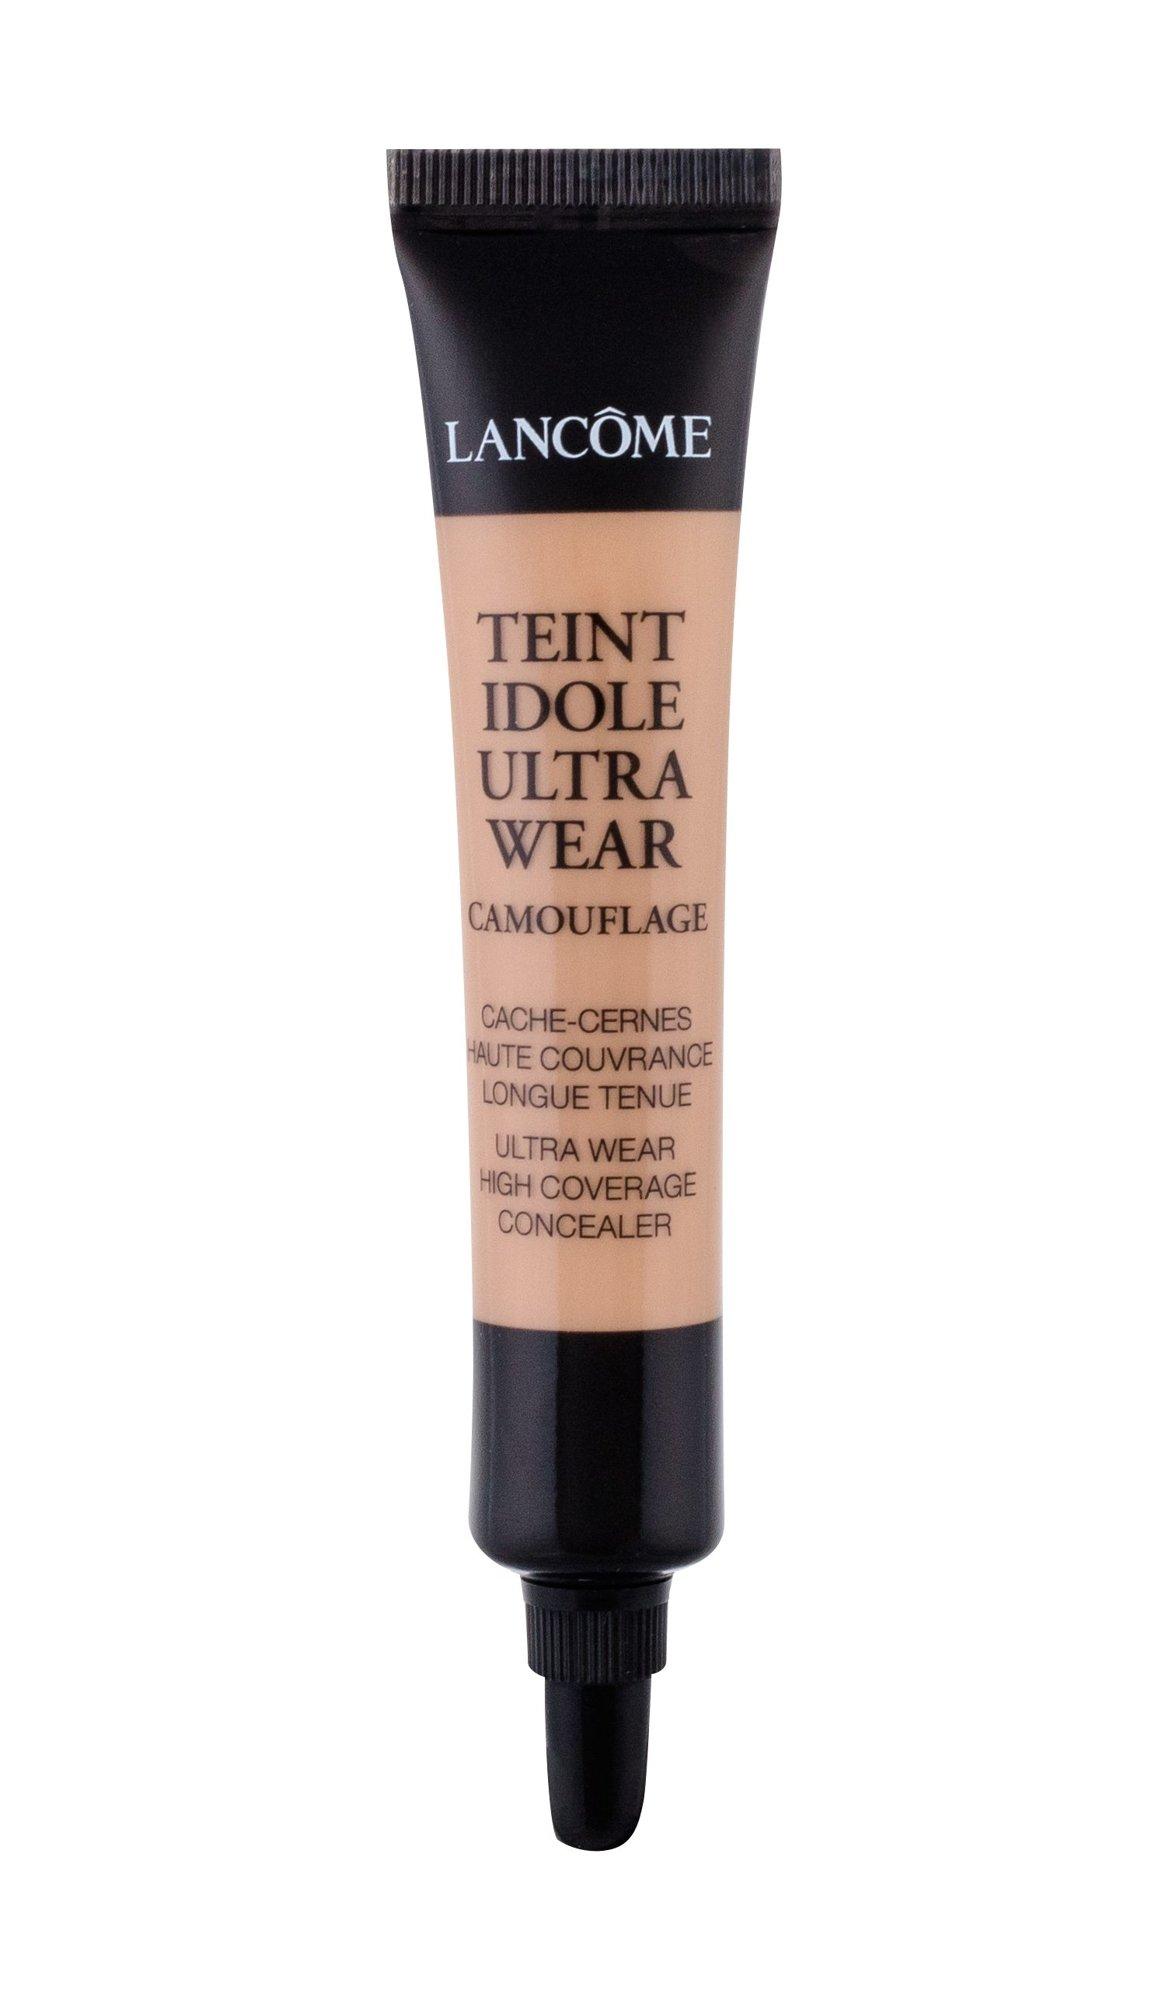 Lancôme Teint Idole Ultra Wear Corrector 12ml 025 Beige Lin Camouflage